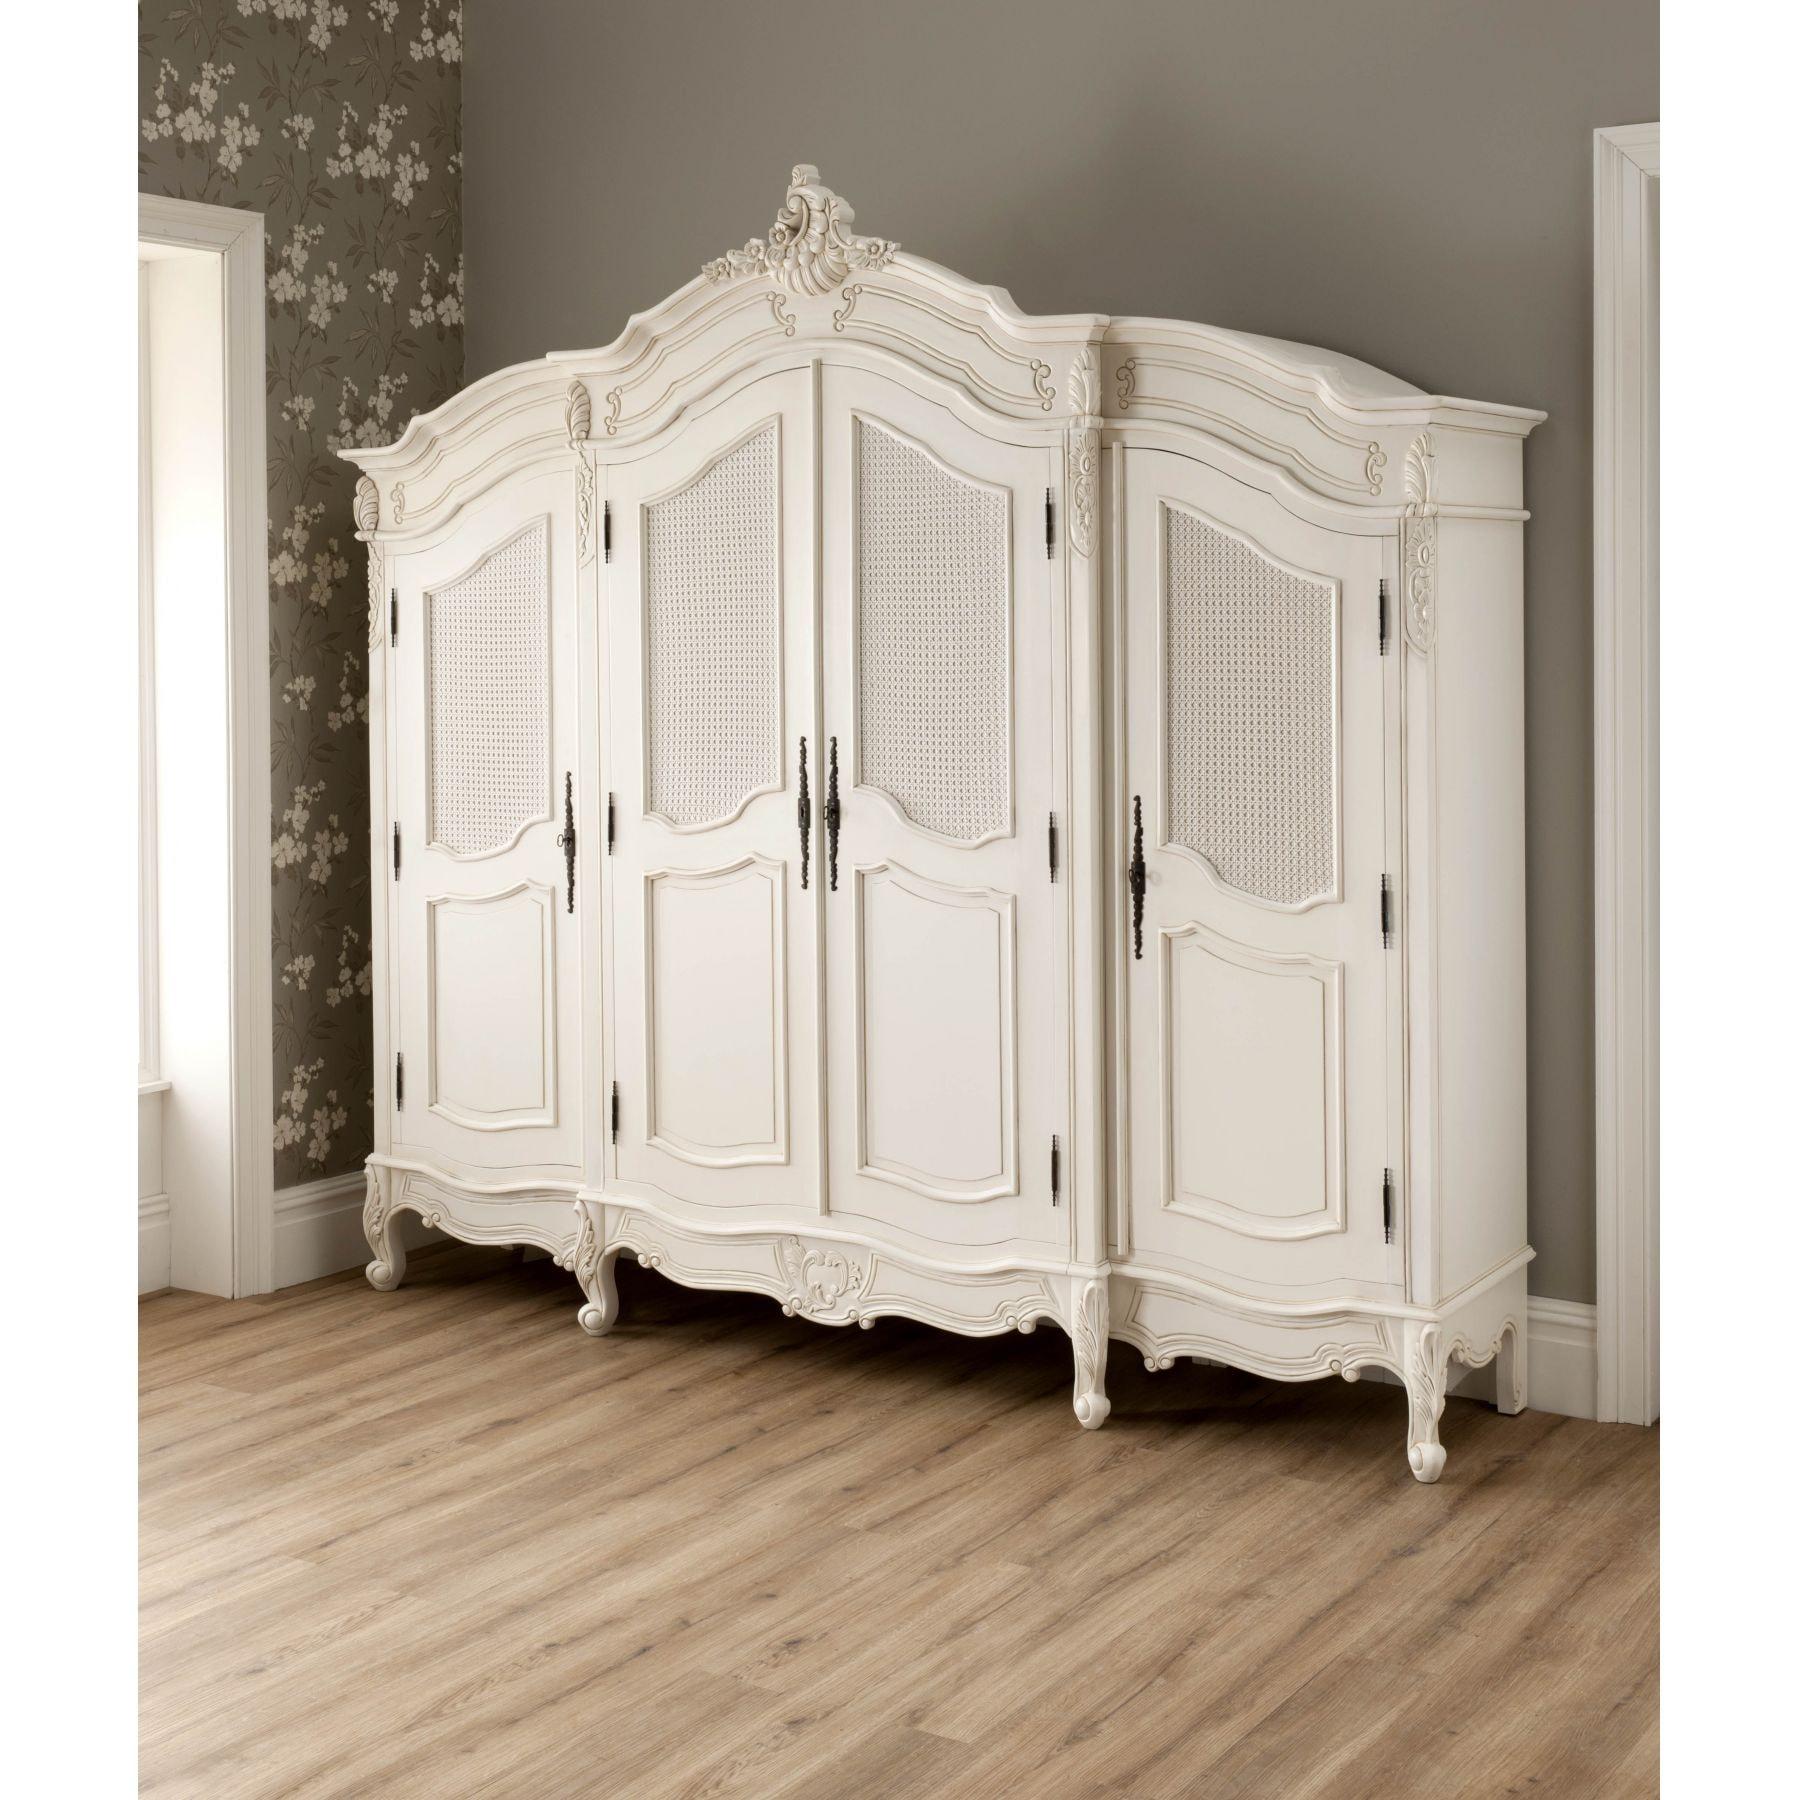 la rochelle antique french wardrobe works wonderful. Black Bedroom Furniture Sets. Home Design Ideas